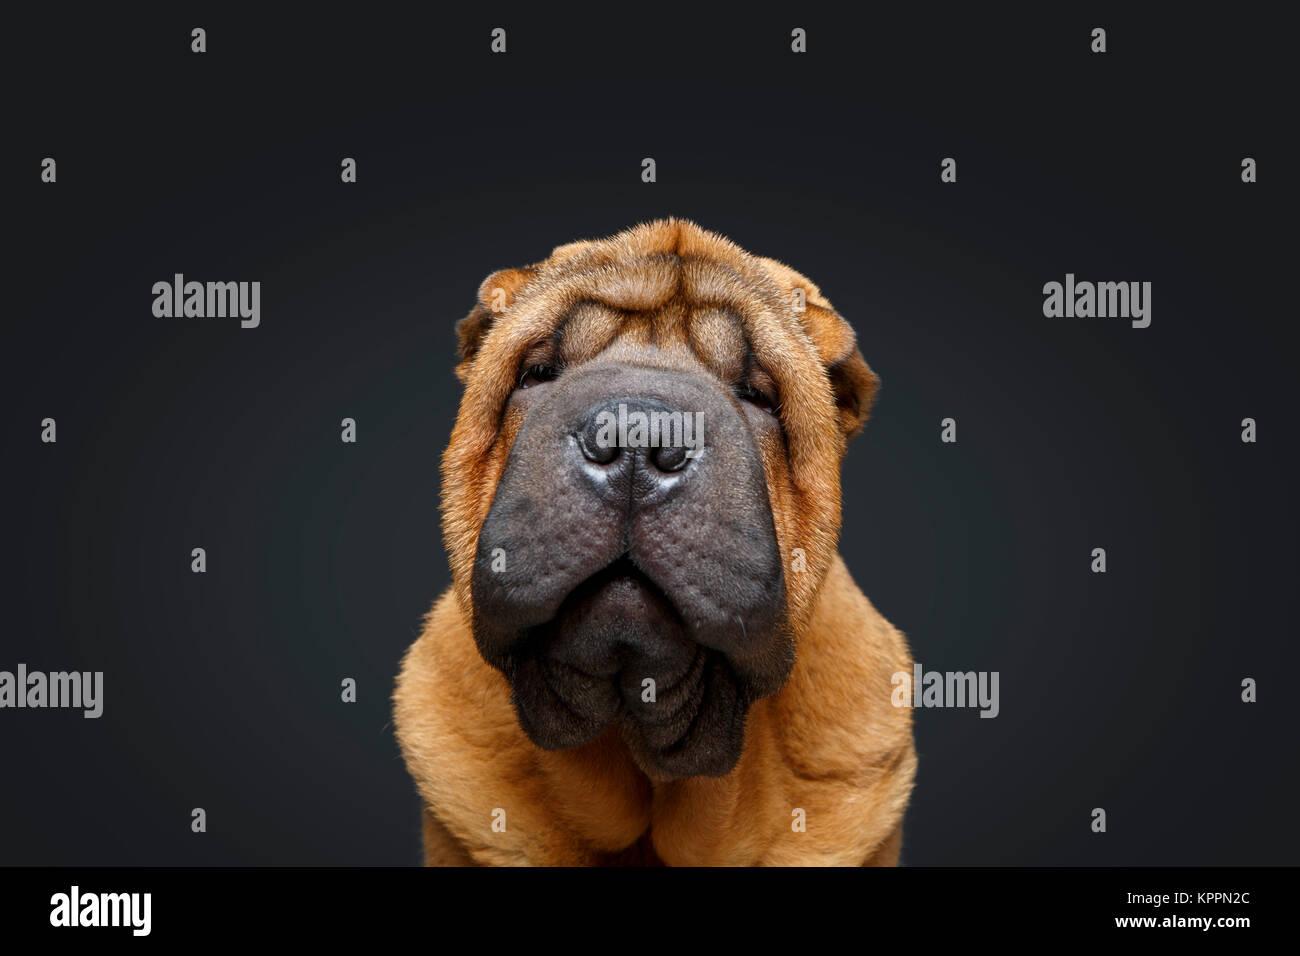 how to train a shar pei puppy